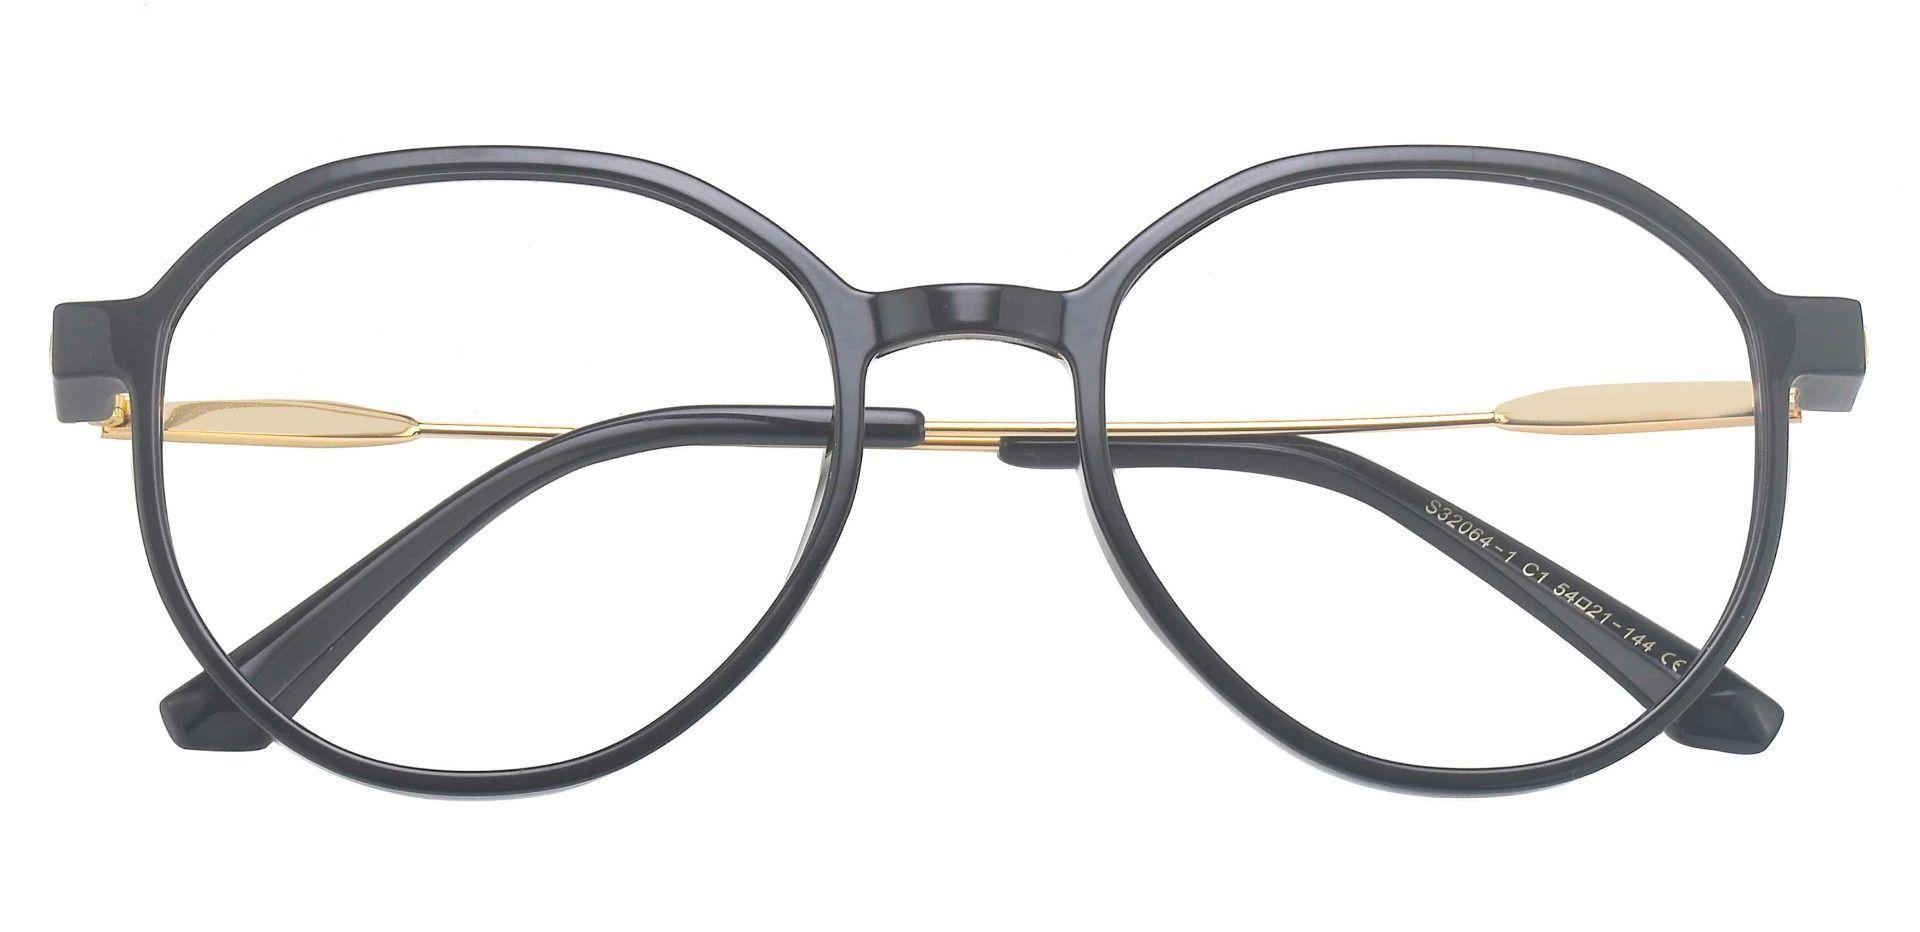 Daytona Geometric Prescription Glasses - Black